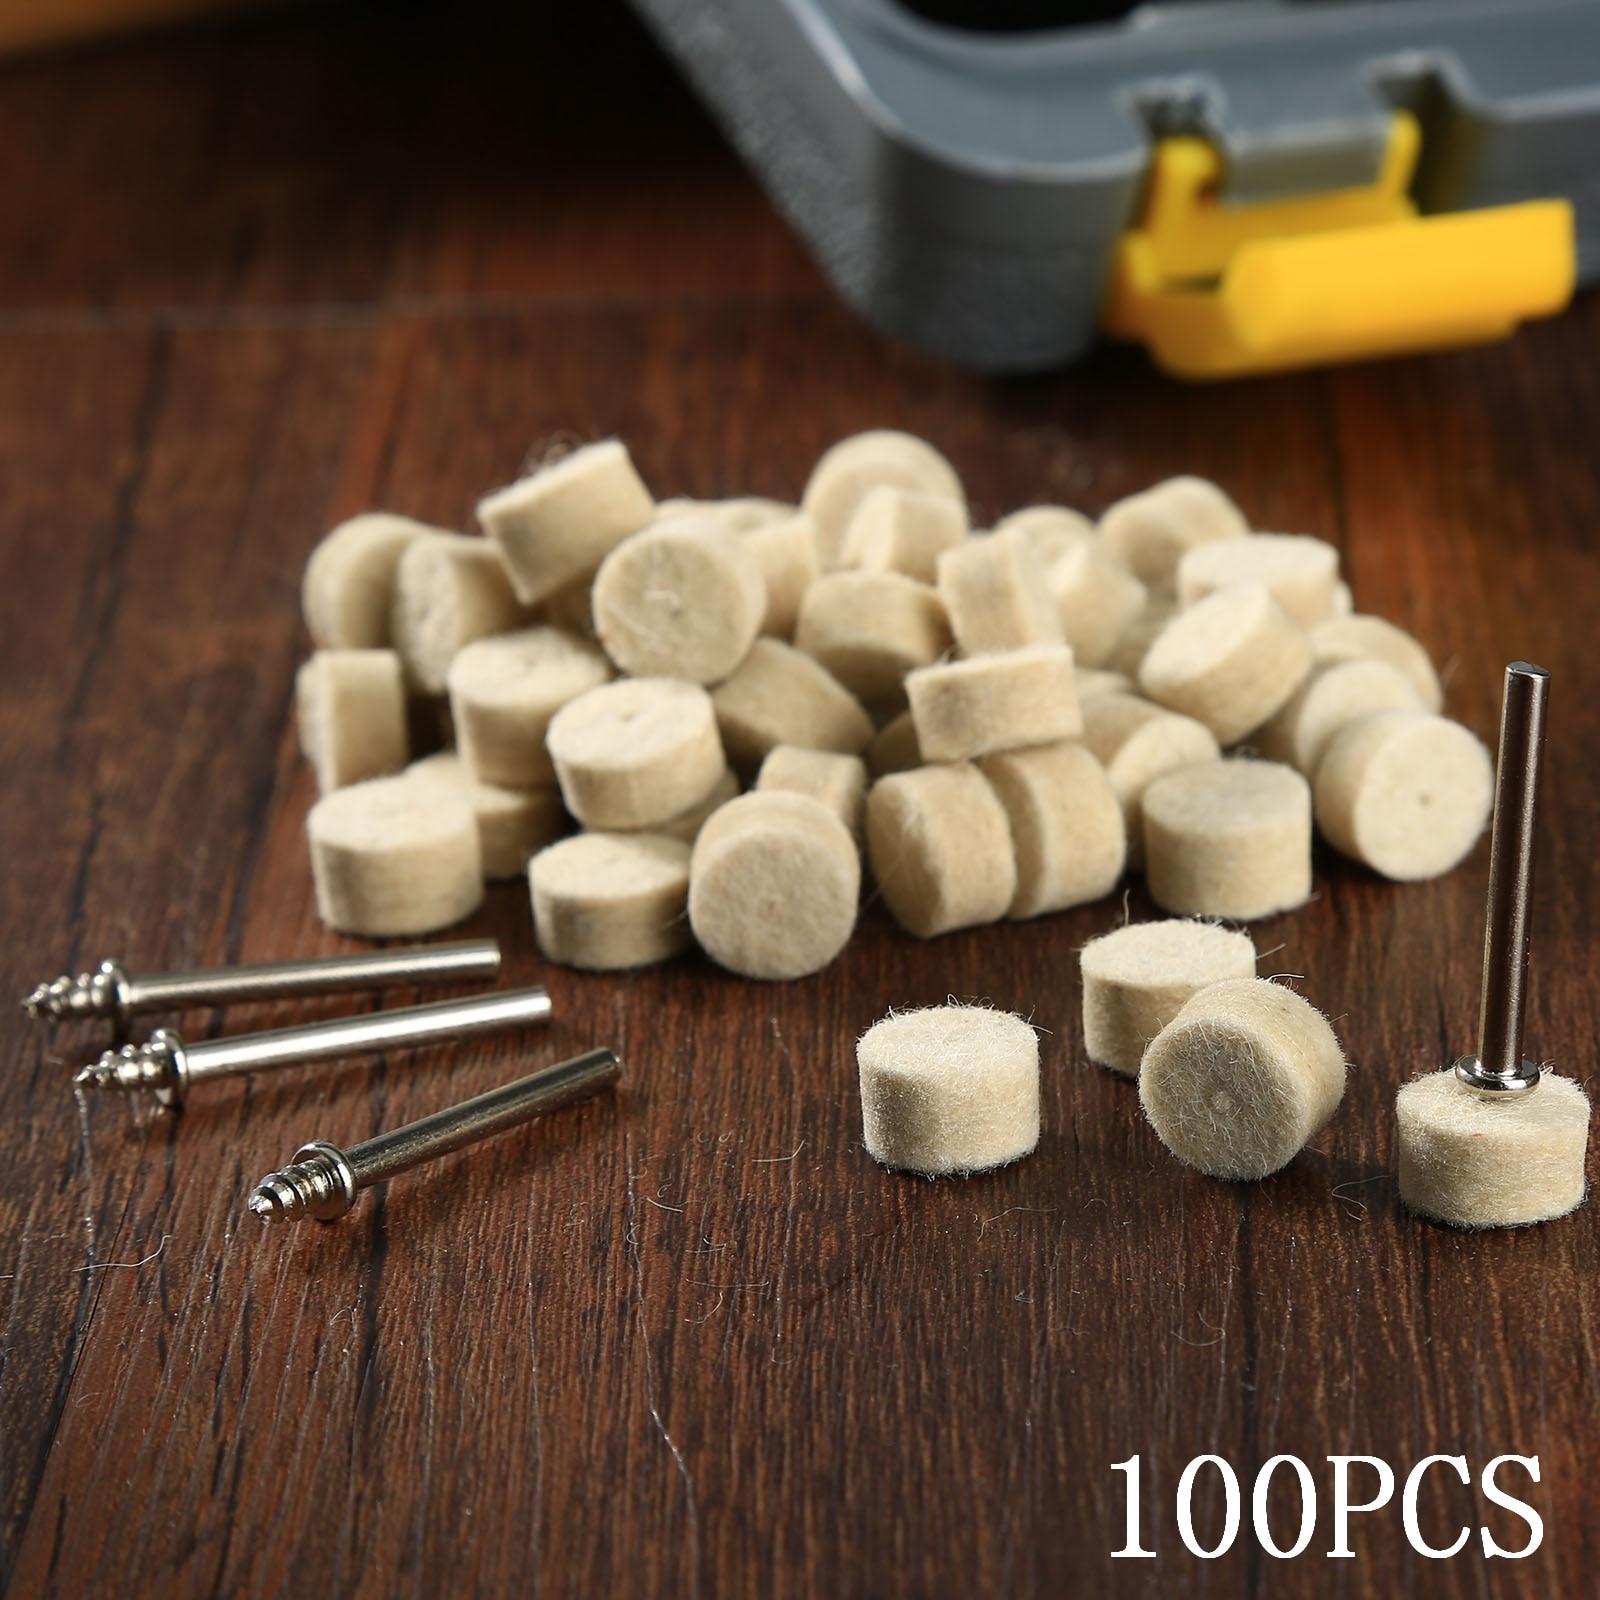 100 pezzi Dremel accessori 13 mm lana feltro lucidatura lucidatura - Utensili elettrici - Fotografia 6